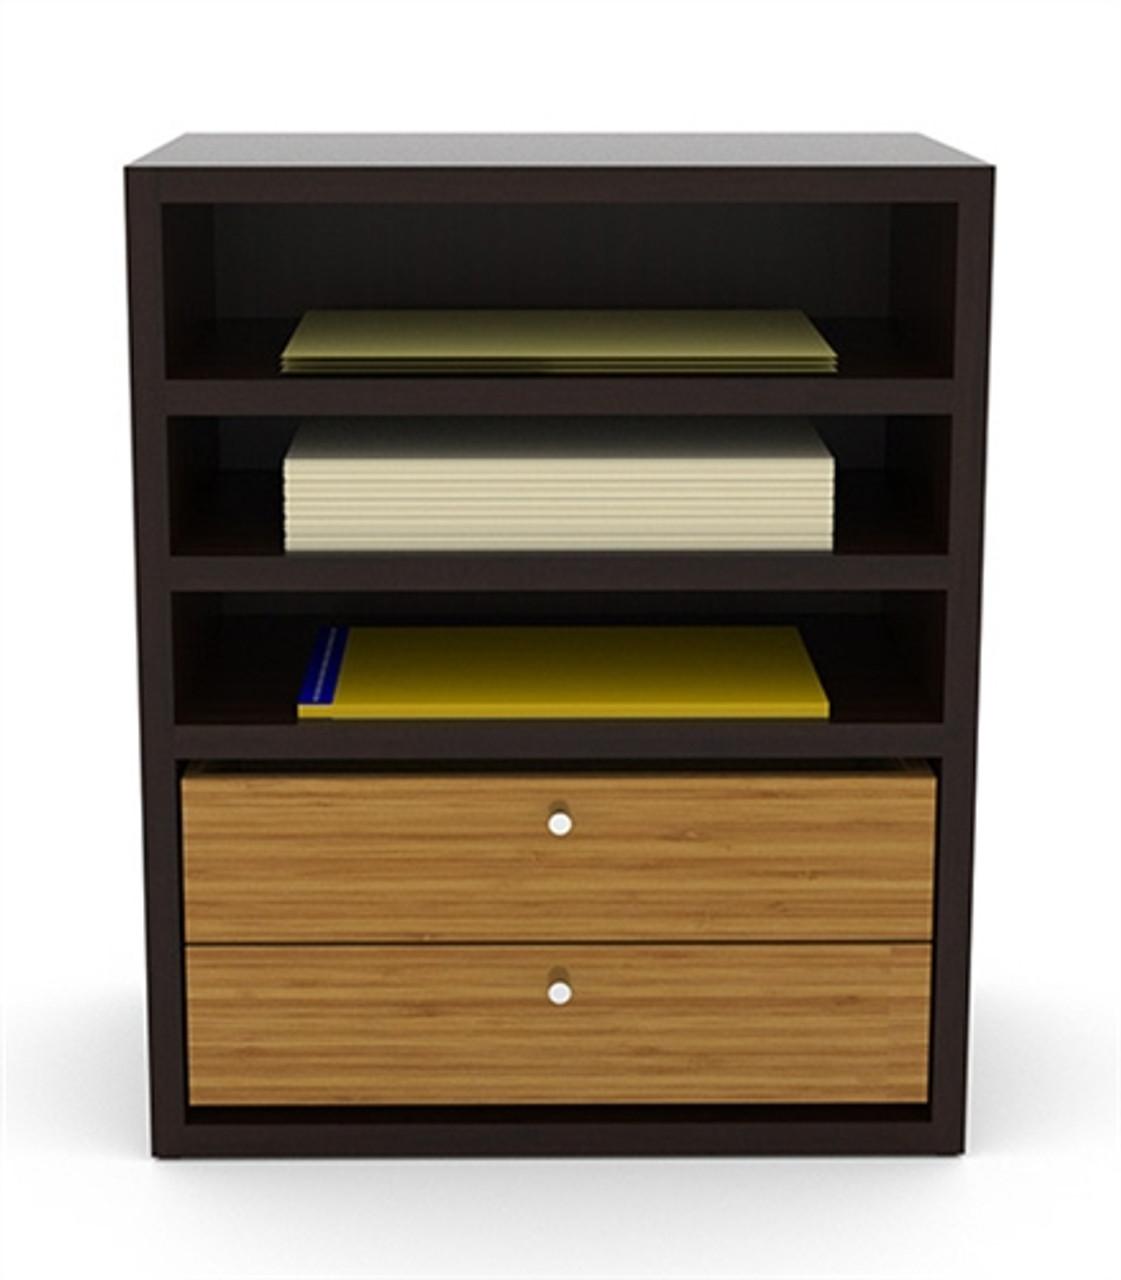 Image of: Cherryman Verde Luxury Modern Table Desk Set